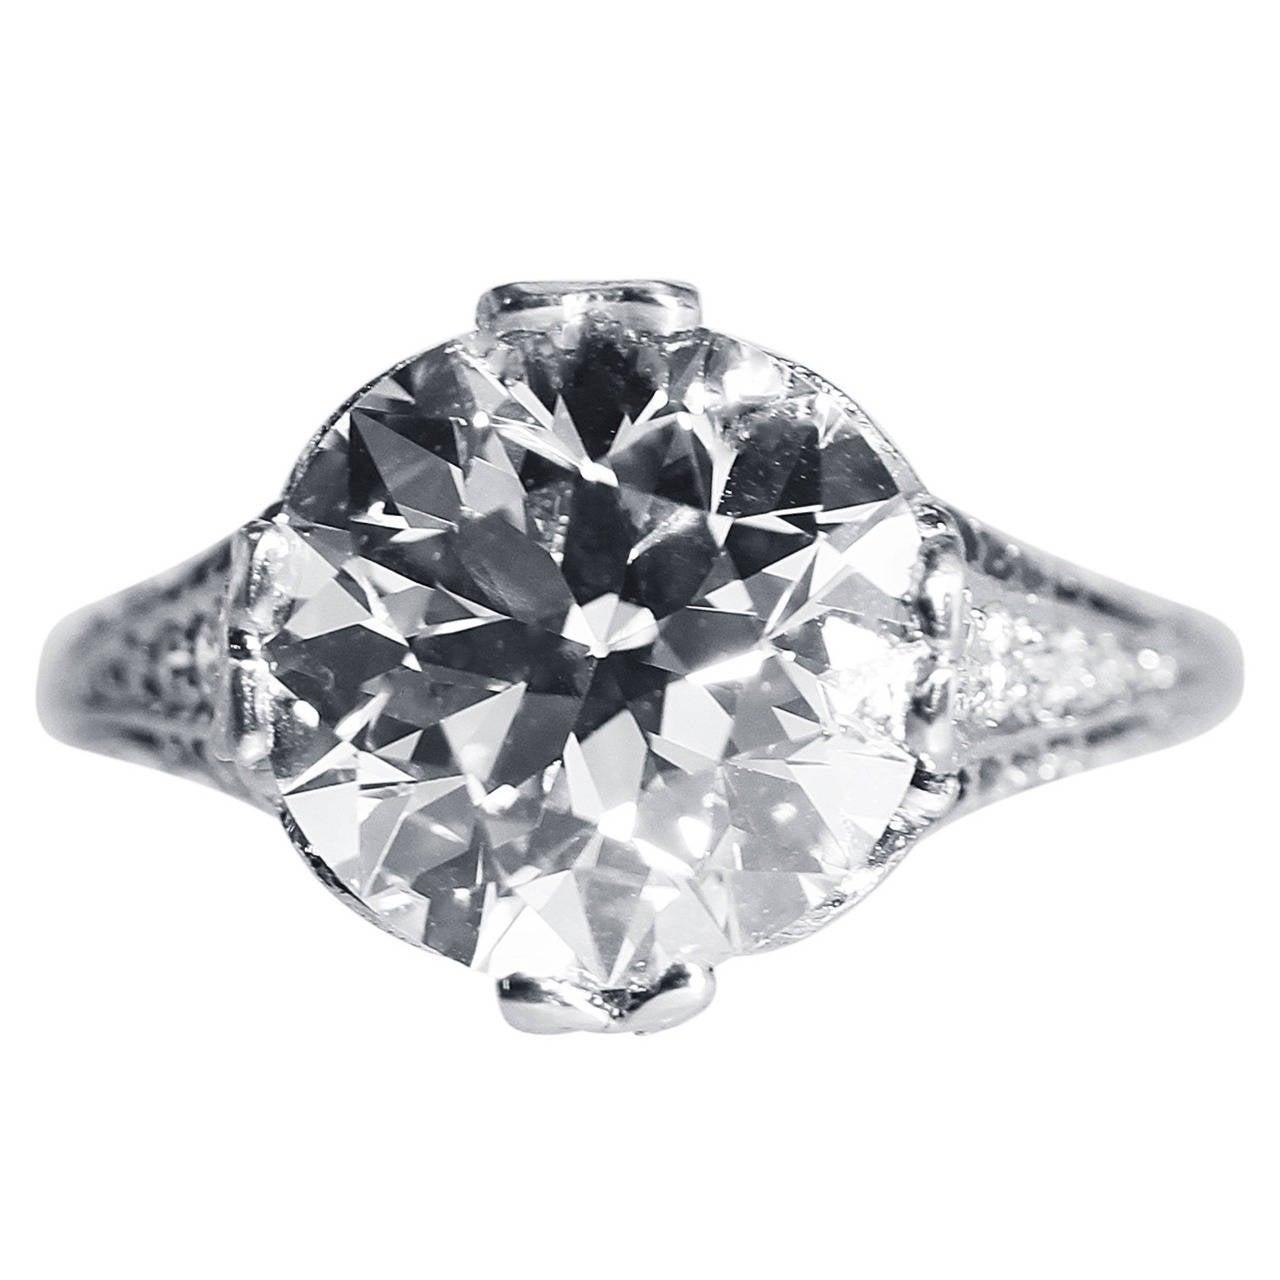 Genurine Edwardian 4 3 4ct Diamond Platinum Engagement Ring at 1stdibs